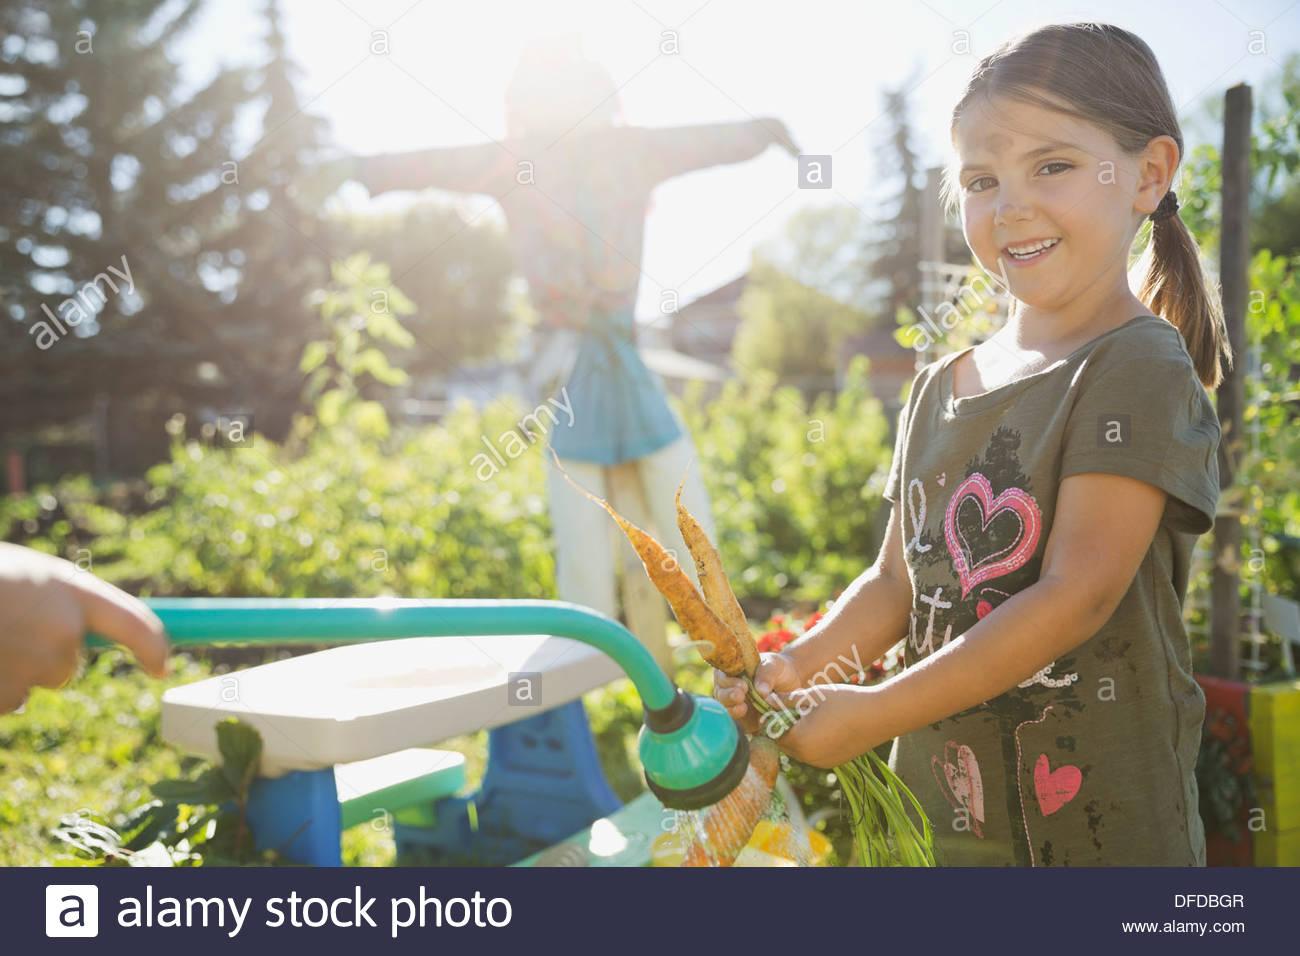 Girl washing freshly harvested carrots with garden hose - Stock Image